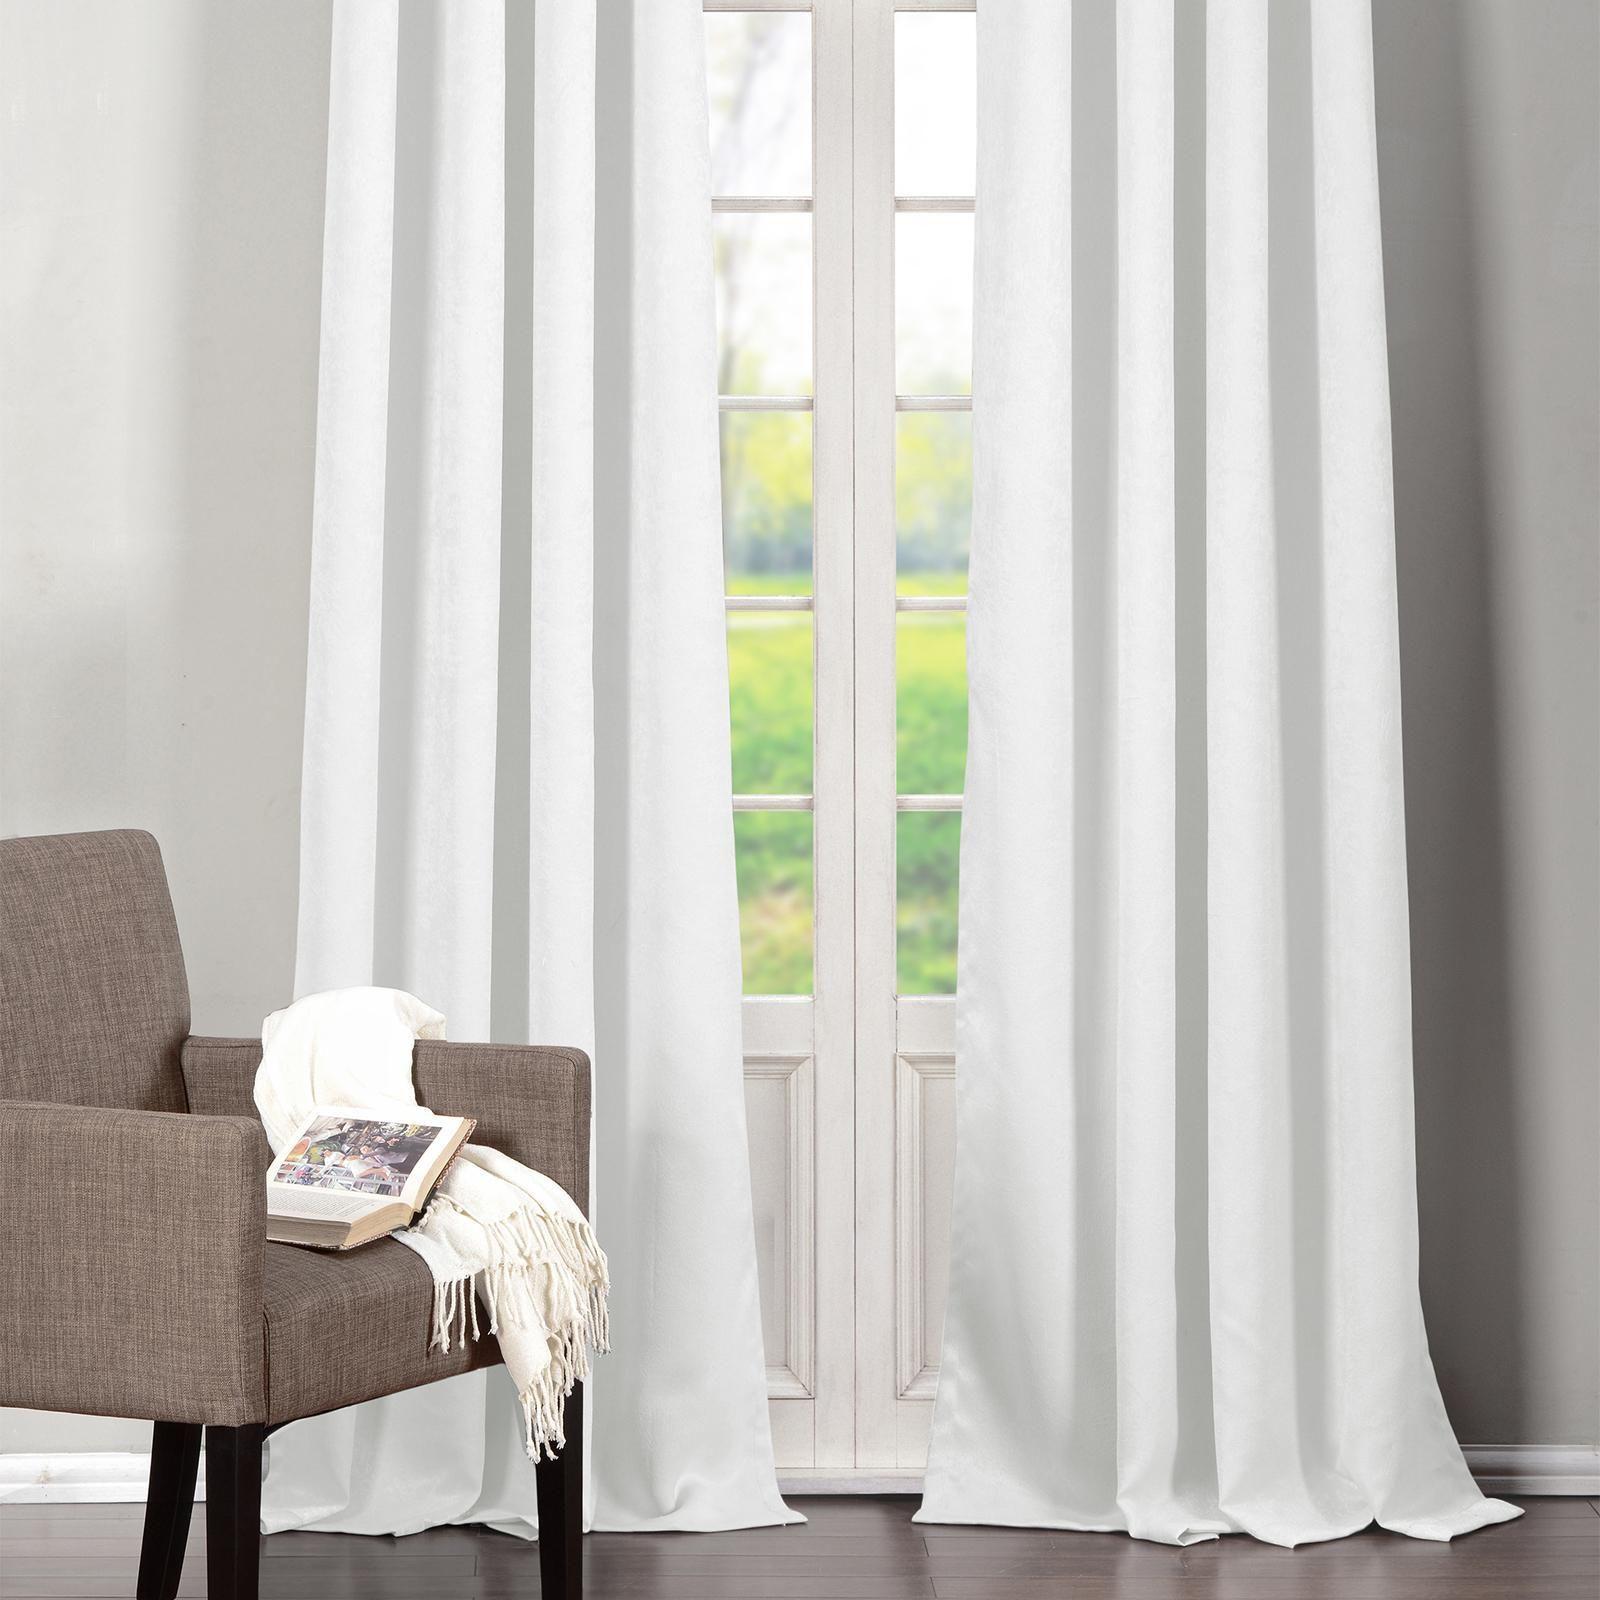 Awesome White Window Treatment Ideas